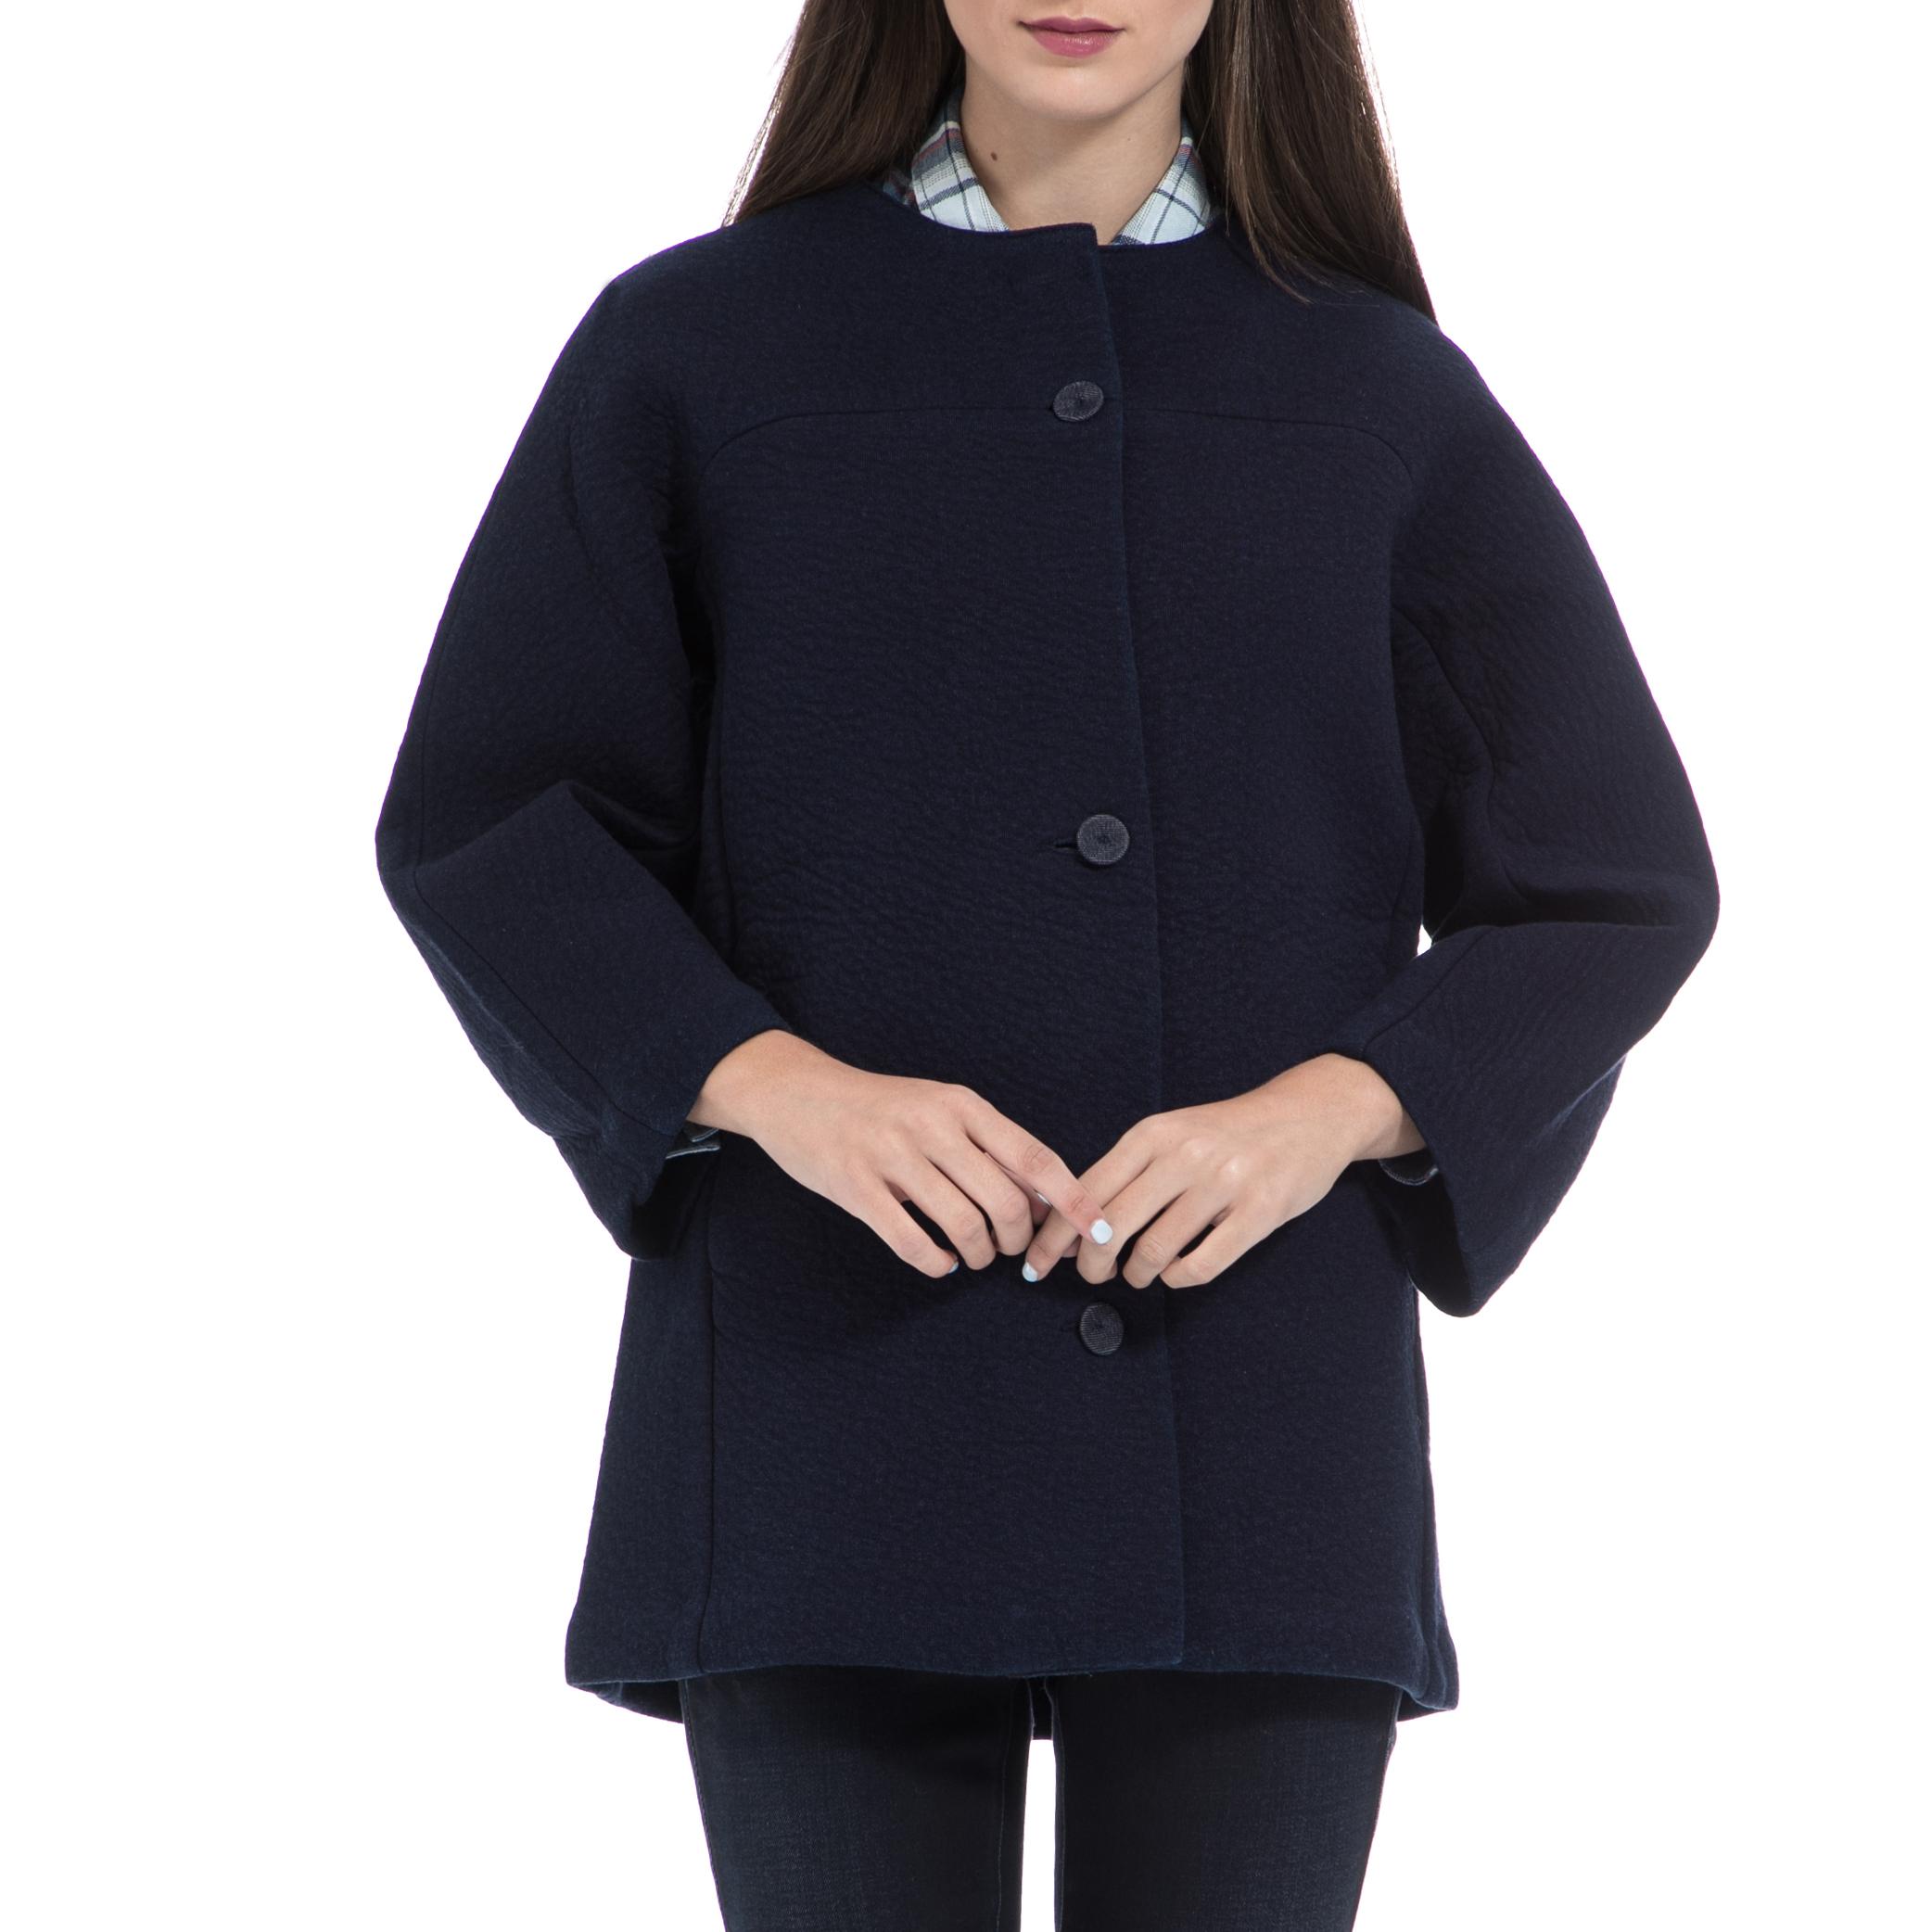 GUESS – Γυναικείο παλτό GUESS μπλε. Κατάστημα  Factory Outlet Έκπτωση  40%  Τιμή  85 7a672a97530